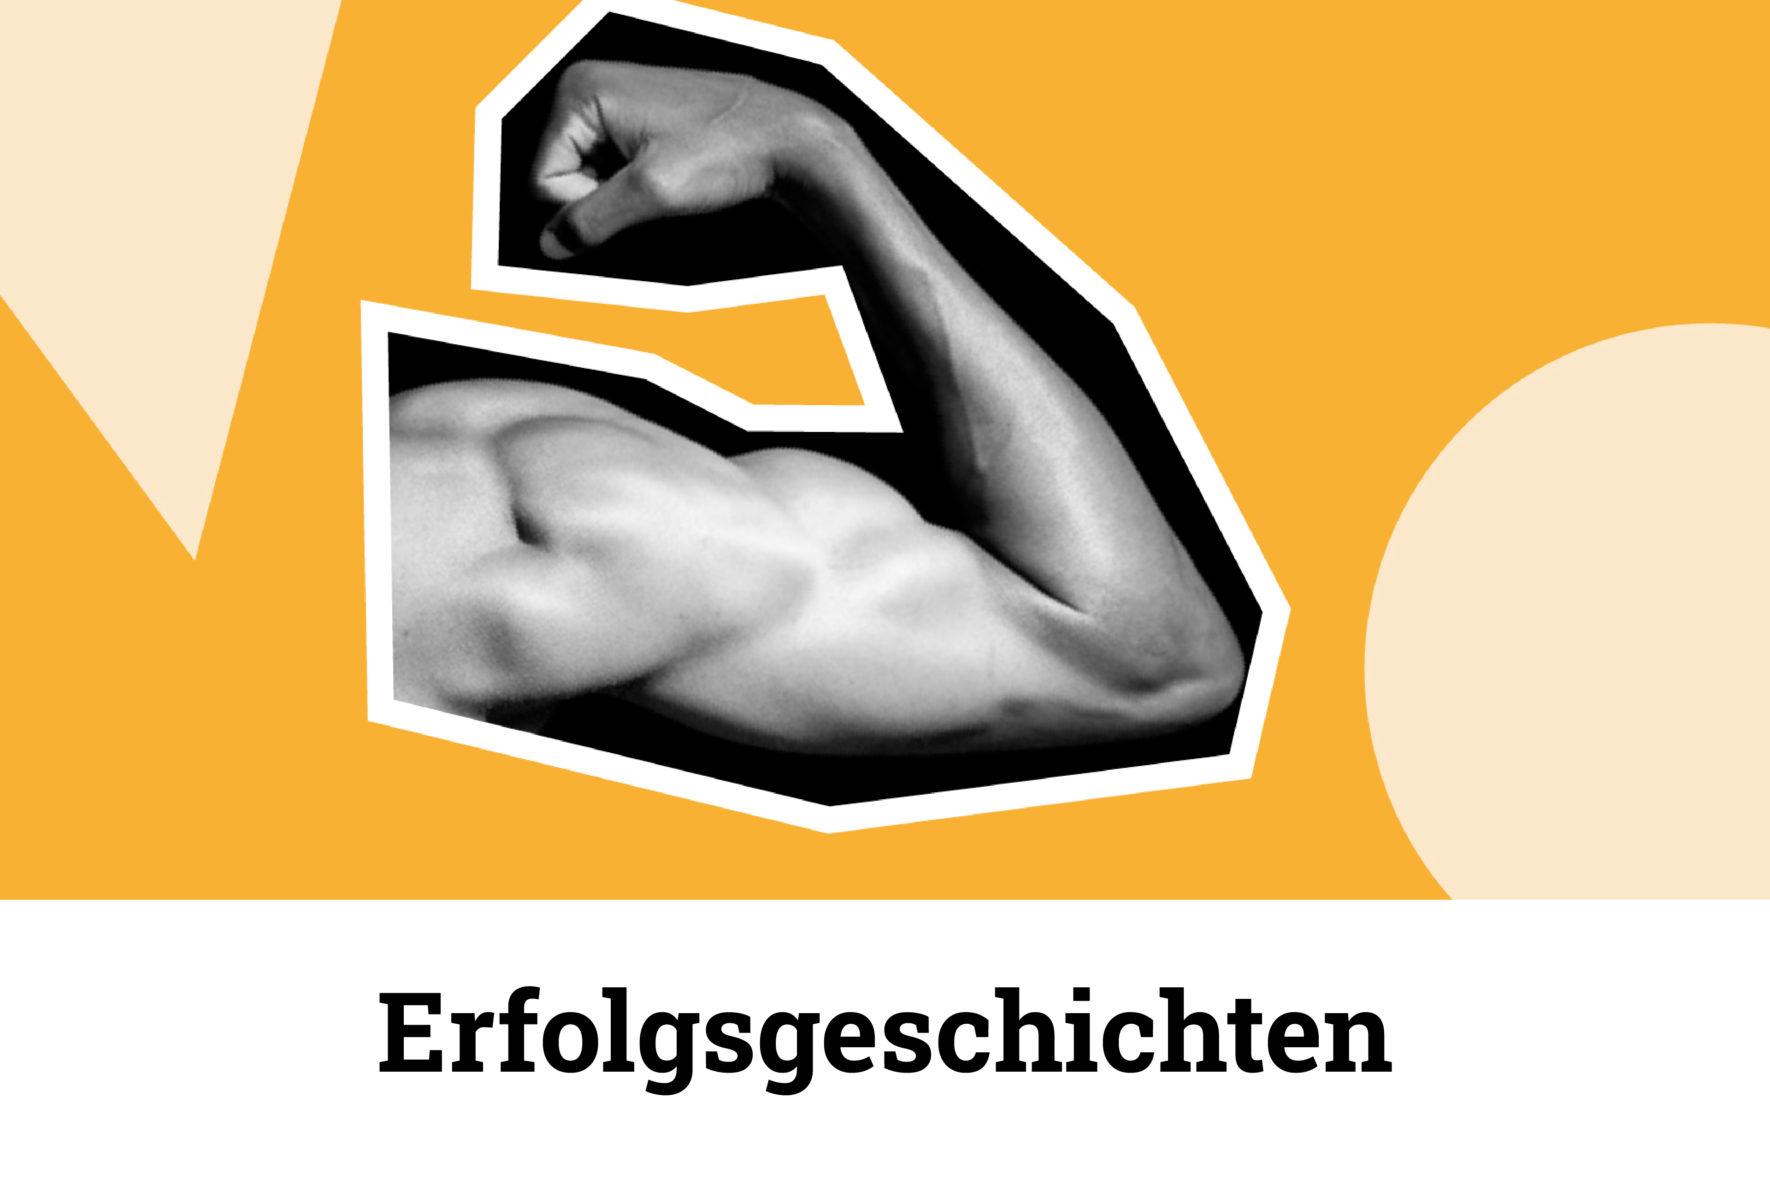 Magnetprodukt-Club-Branding-Logo-Entwicklung-FORMLOS-Berlin-Gestaltung-Design-Forenbilder-BildspracheErfolgsgeschichten